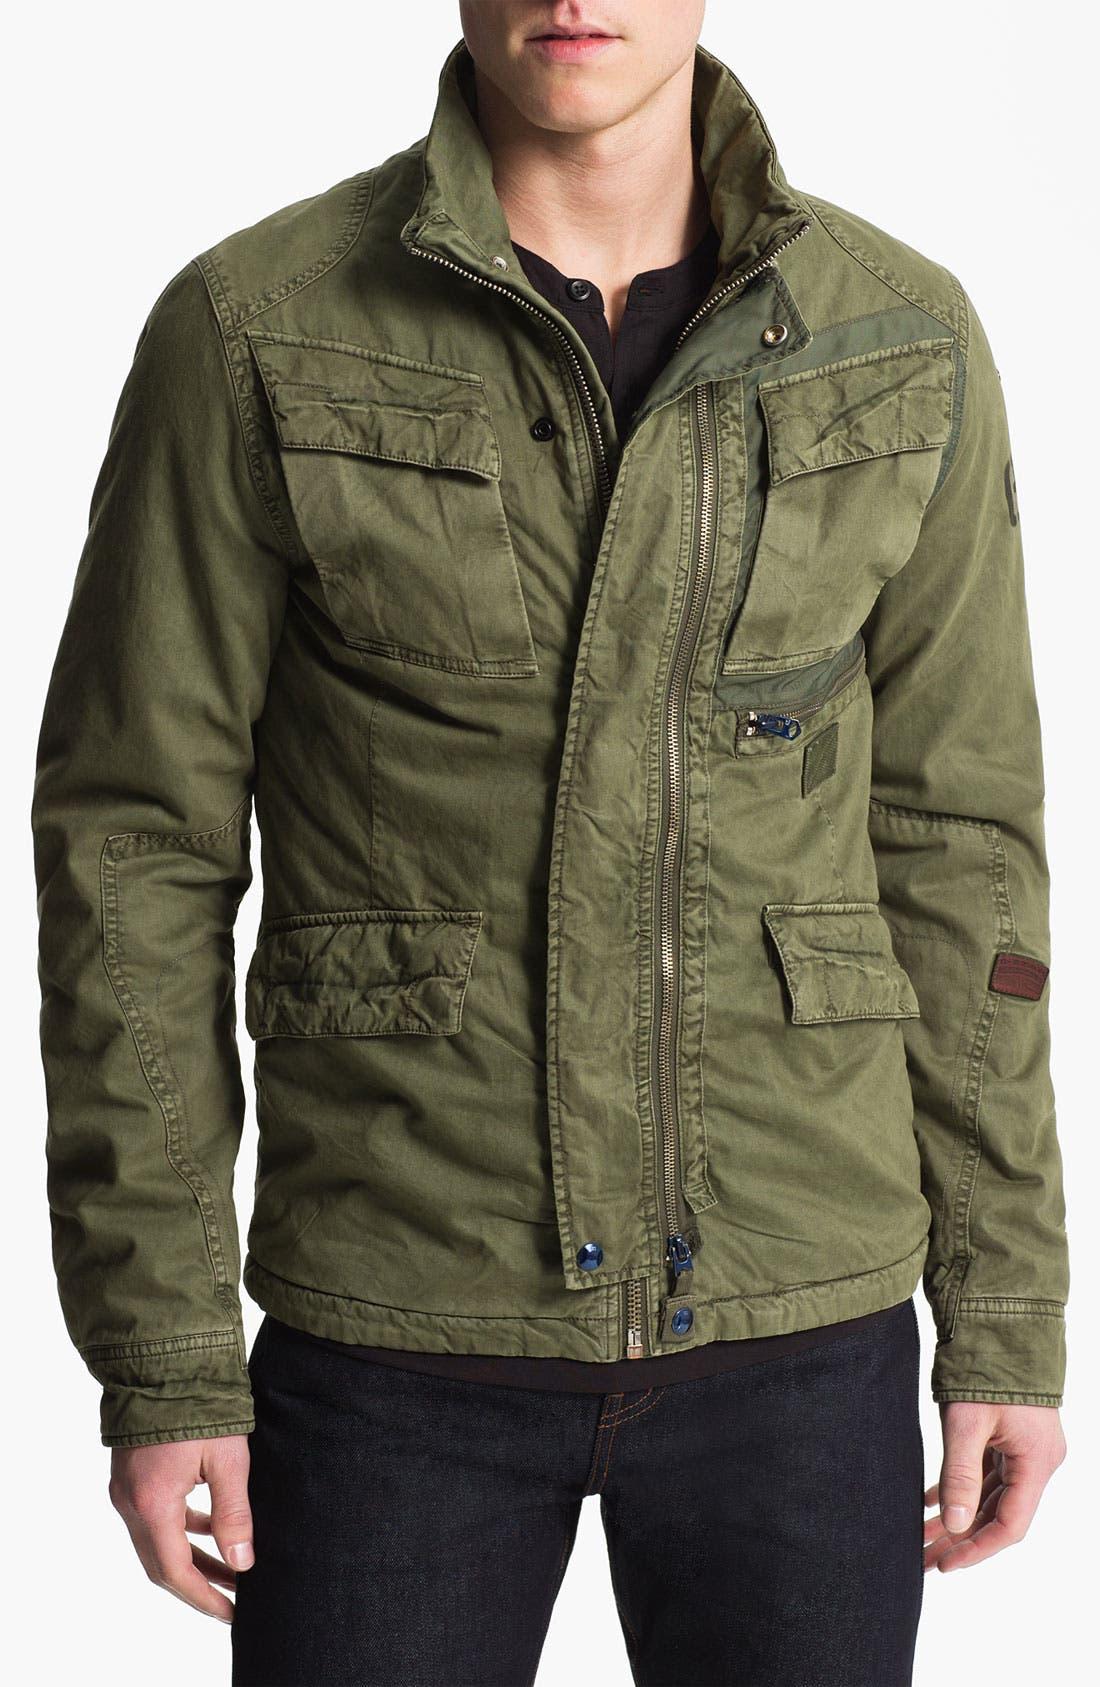 Alternate Image 1 Selected - G-Star Raw 'Aero' Field Jacket